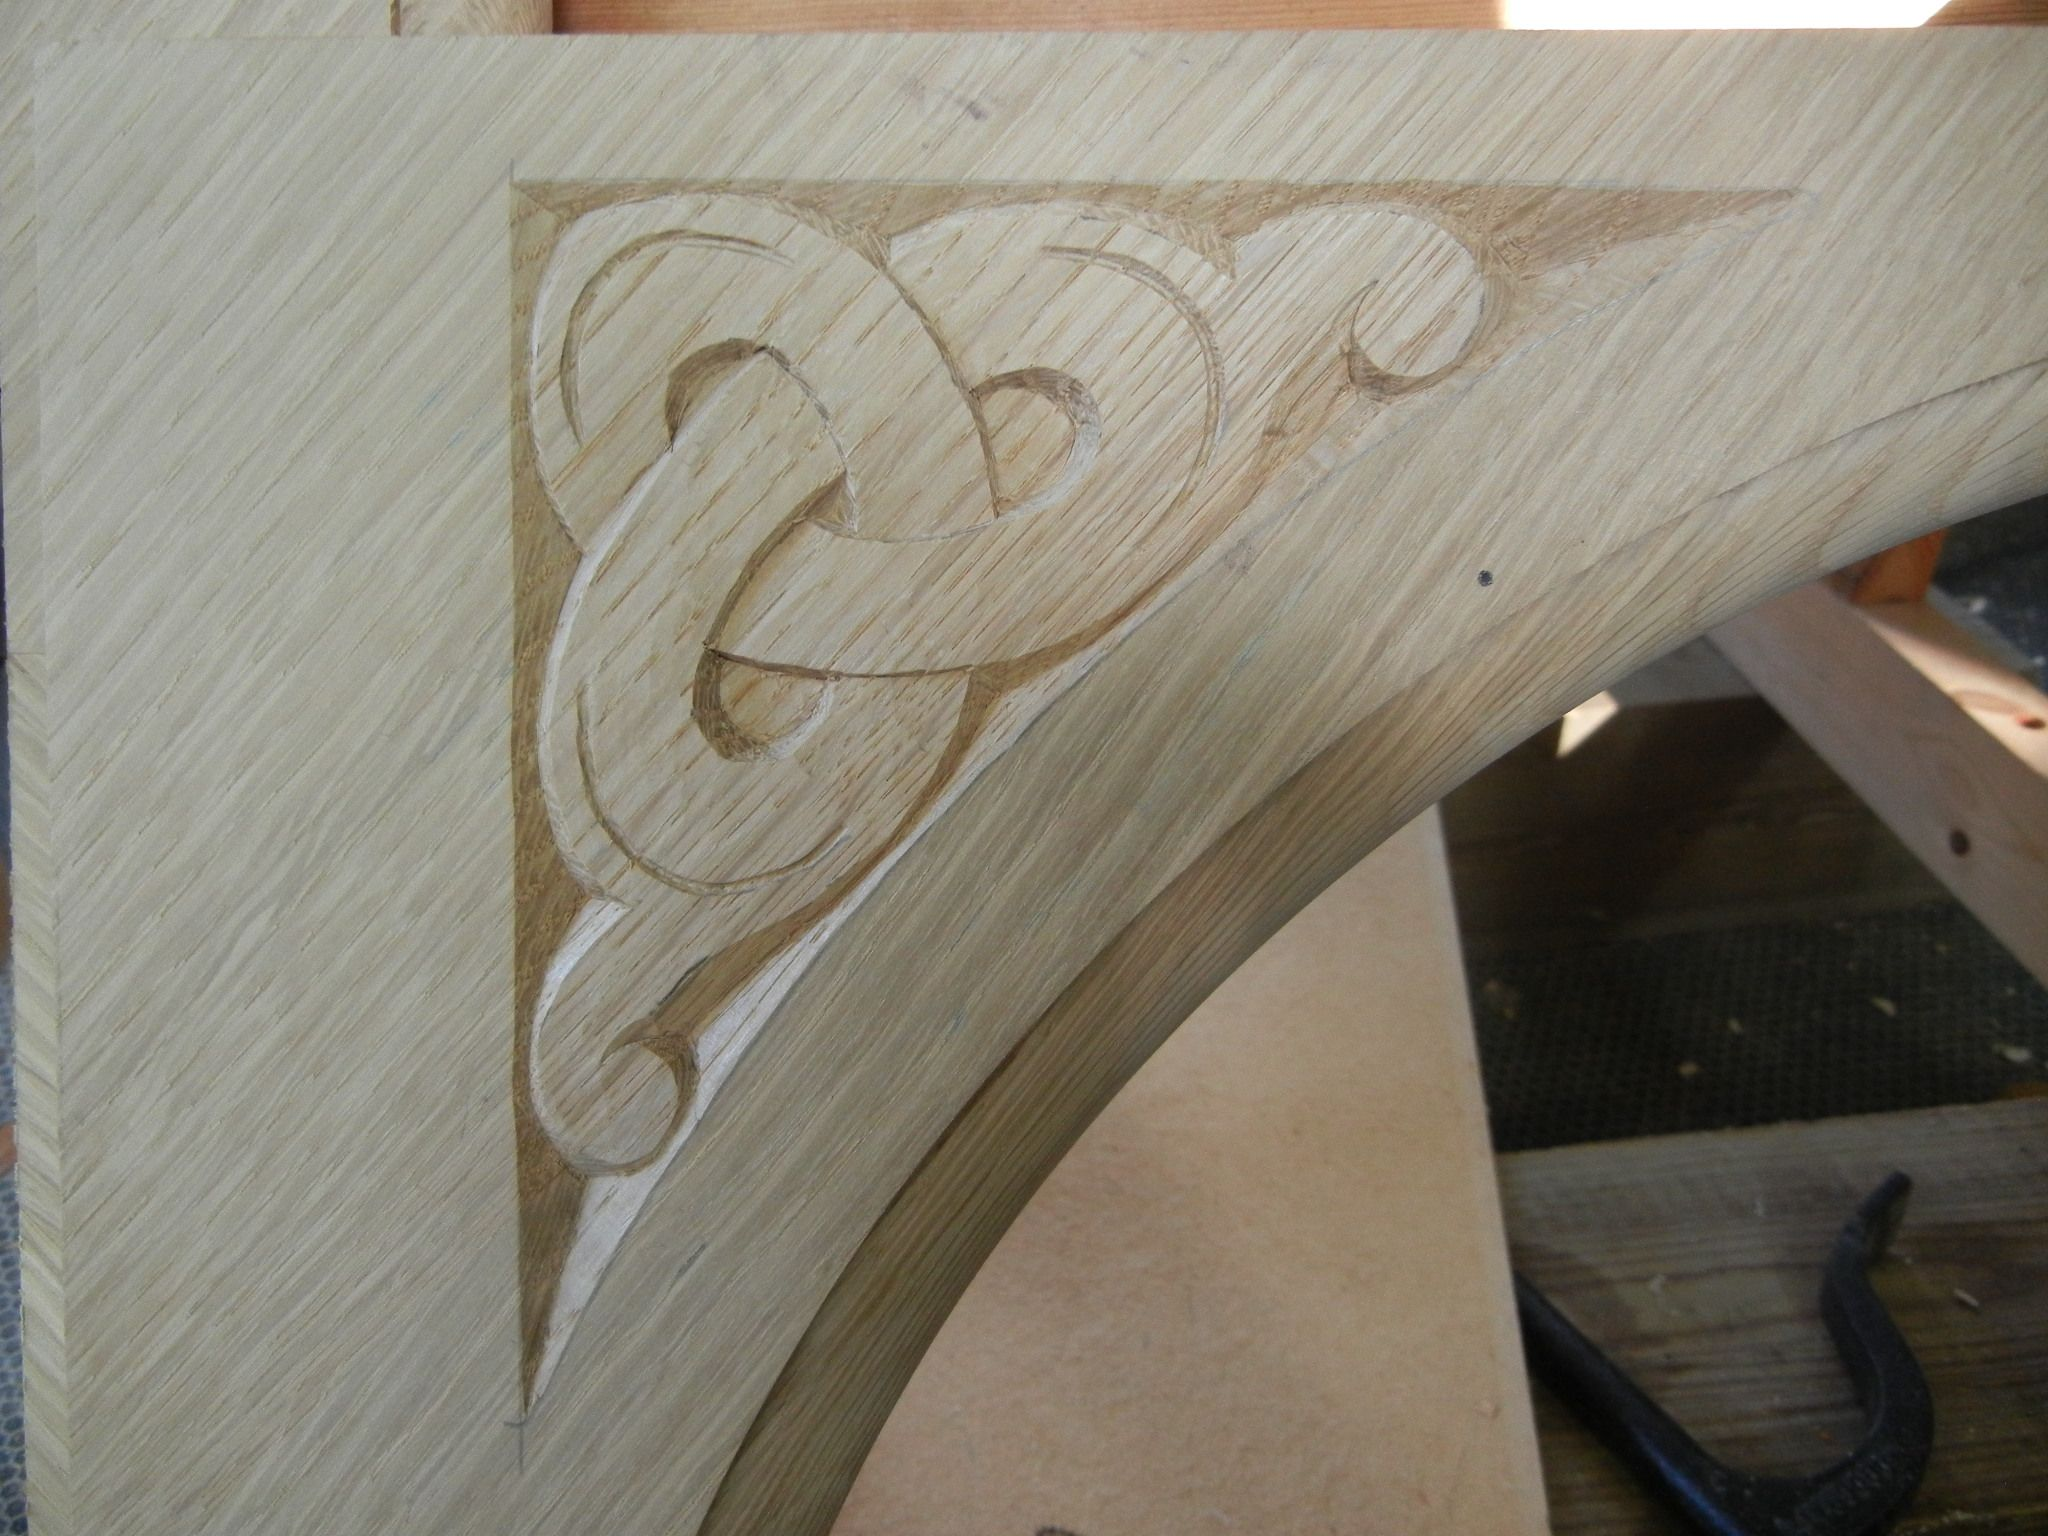 Carved true lovers knot karvsnitt chip carving pinterest